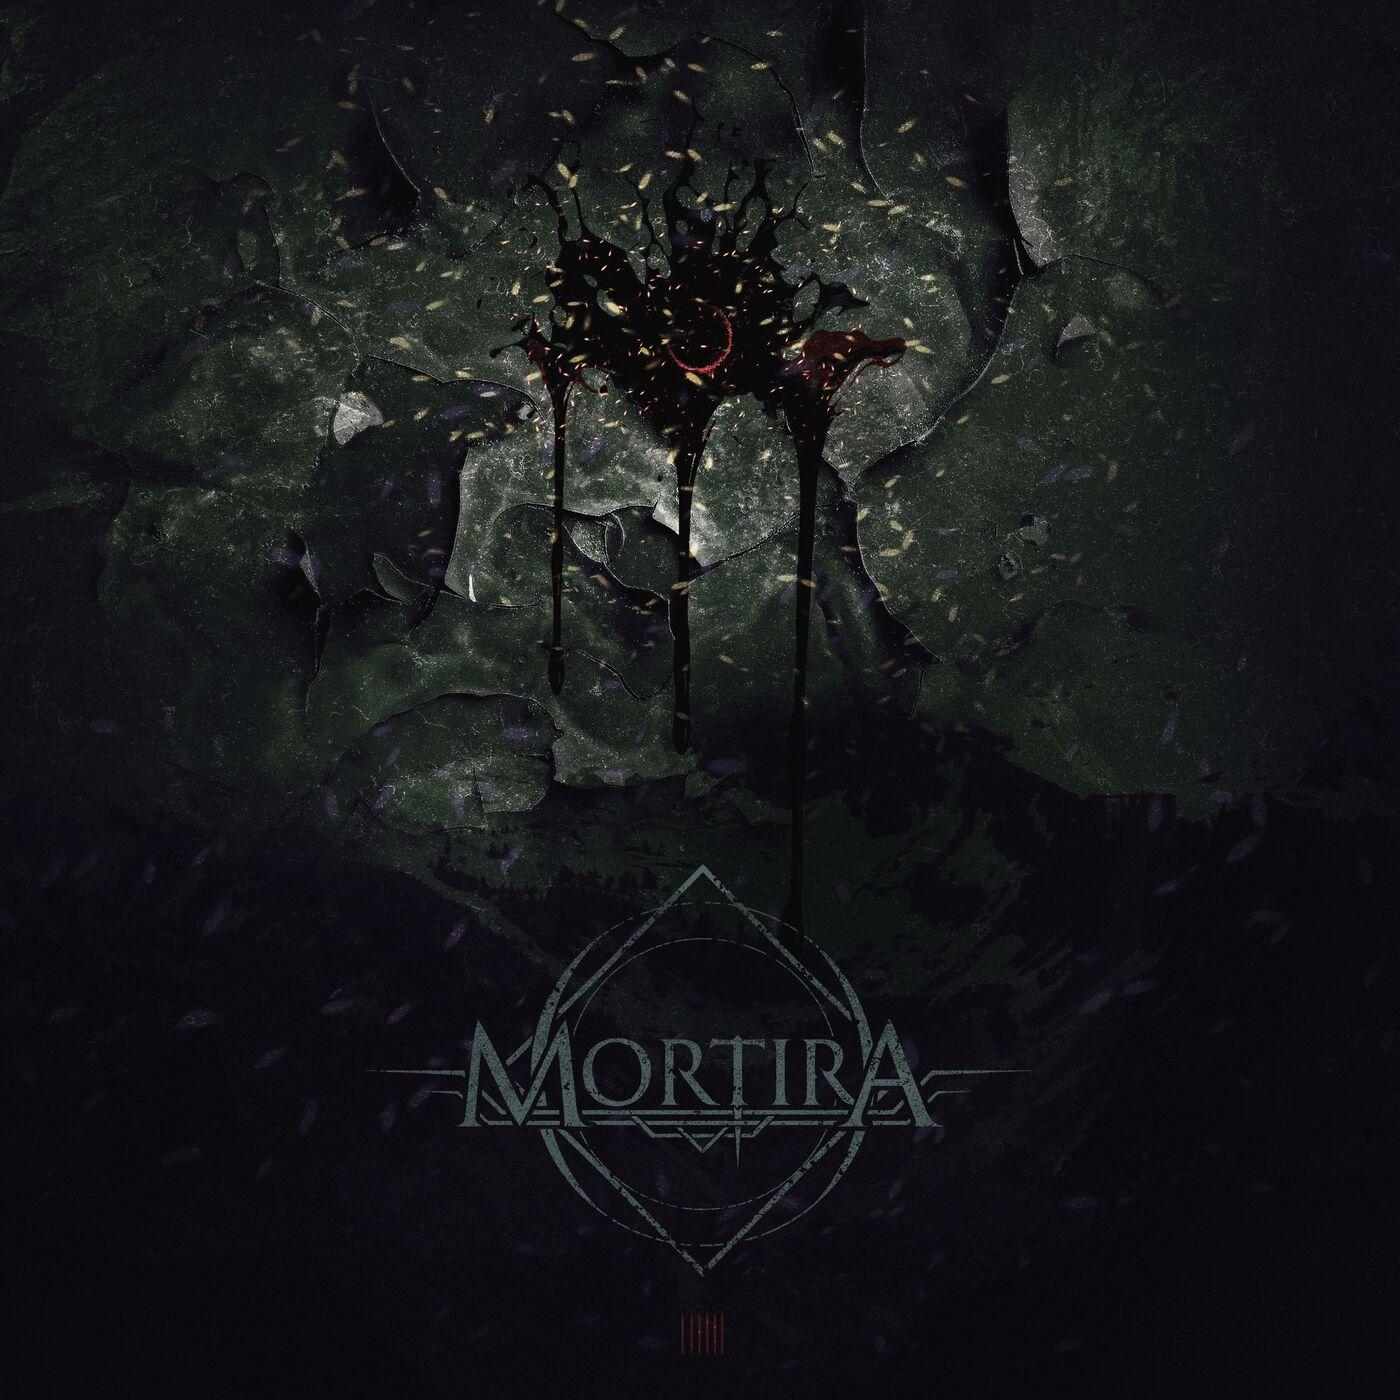 Mortira - Mortira [EP] (2020)